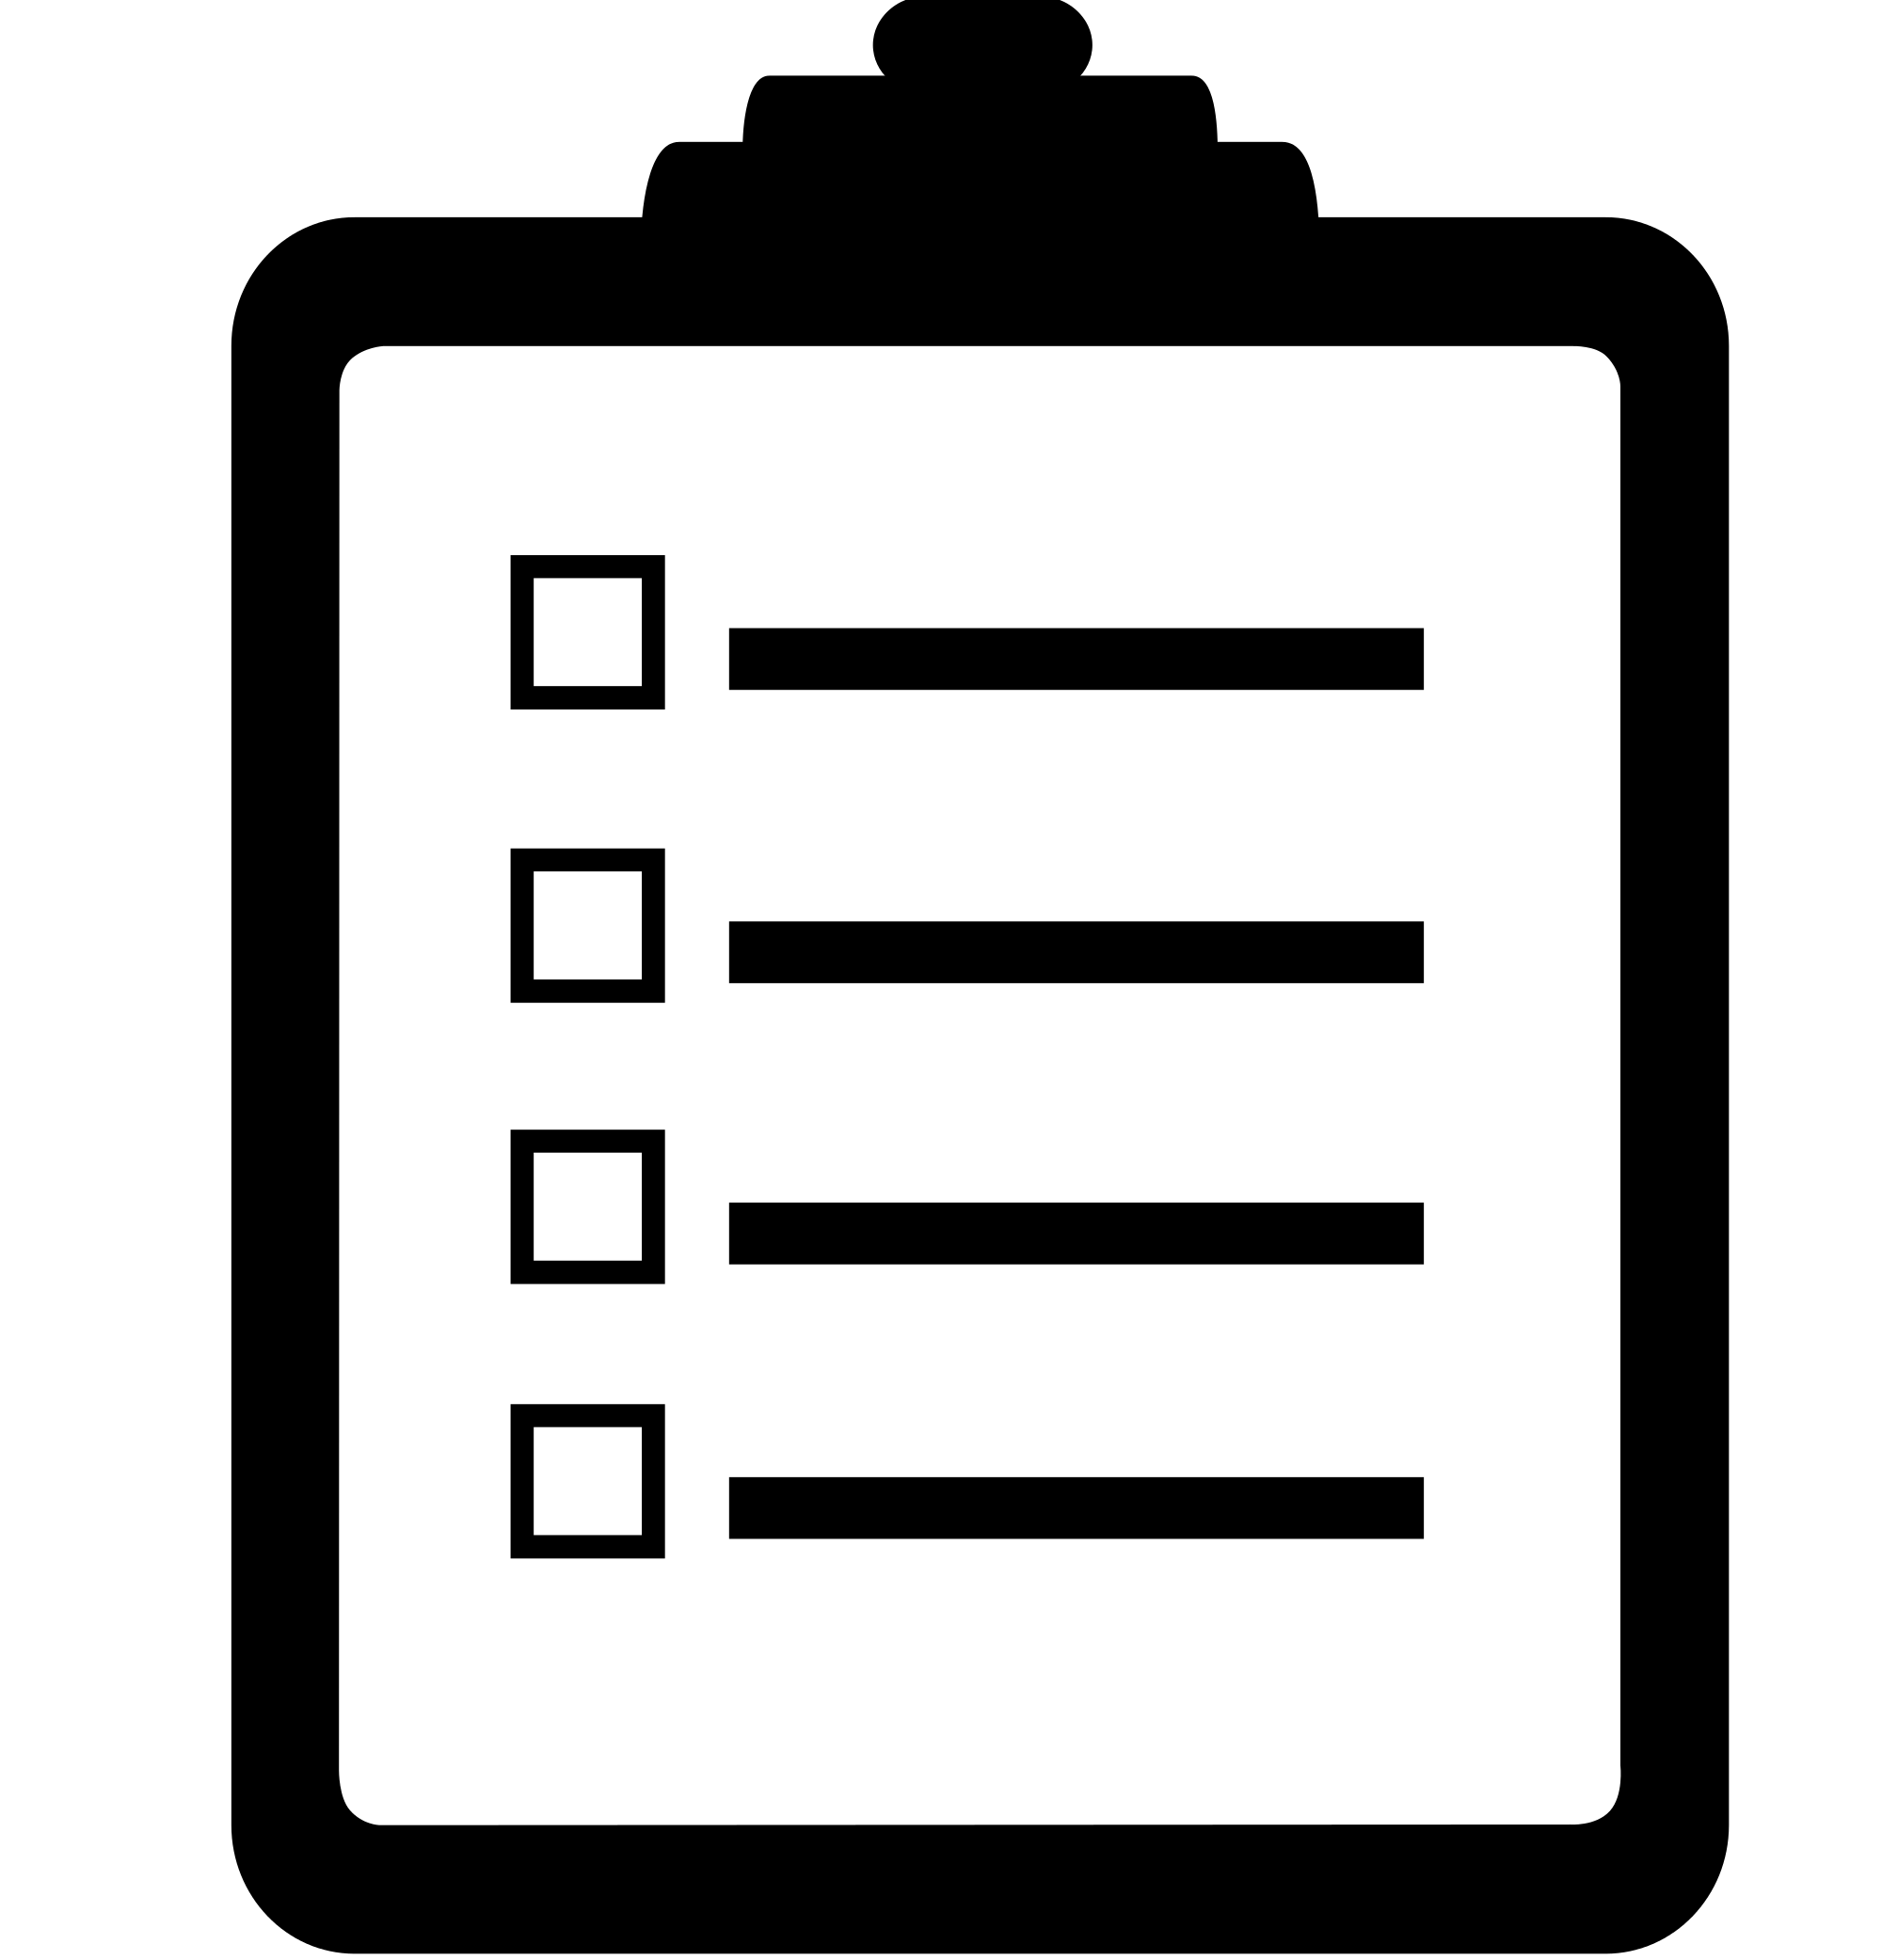 Clipboard-clipart